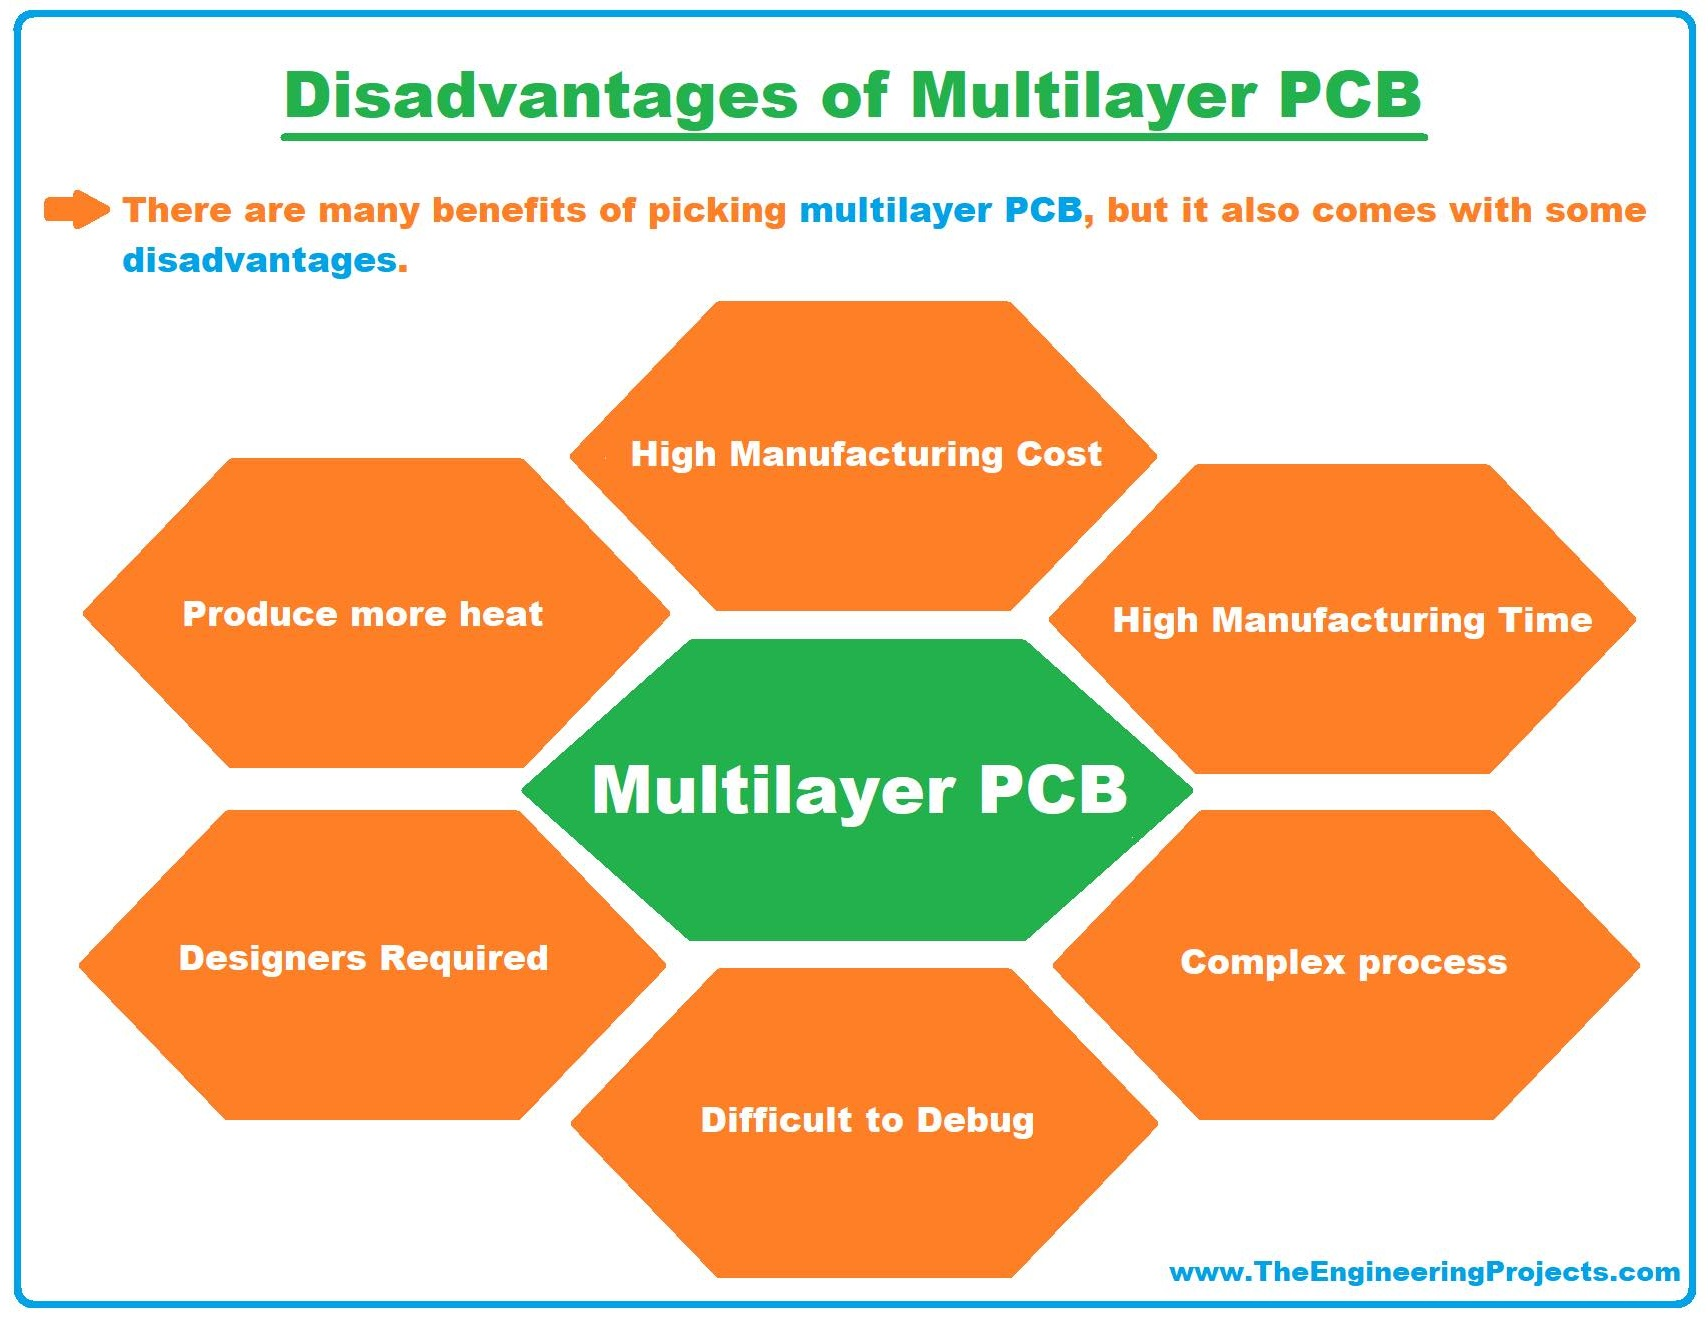 Multilayer PCB, what is Multilayer PCB, Multilayer PCB basics, Multilayer PCB disadvantages, Multilayer PCB applications, disadvantages of Multilayer PCB, examples of multilayer pcb